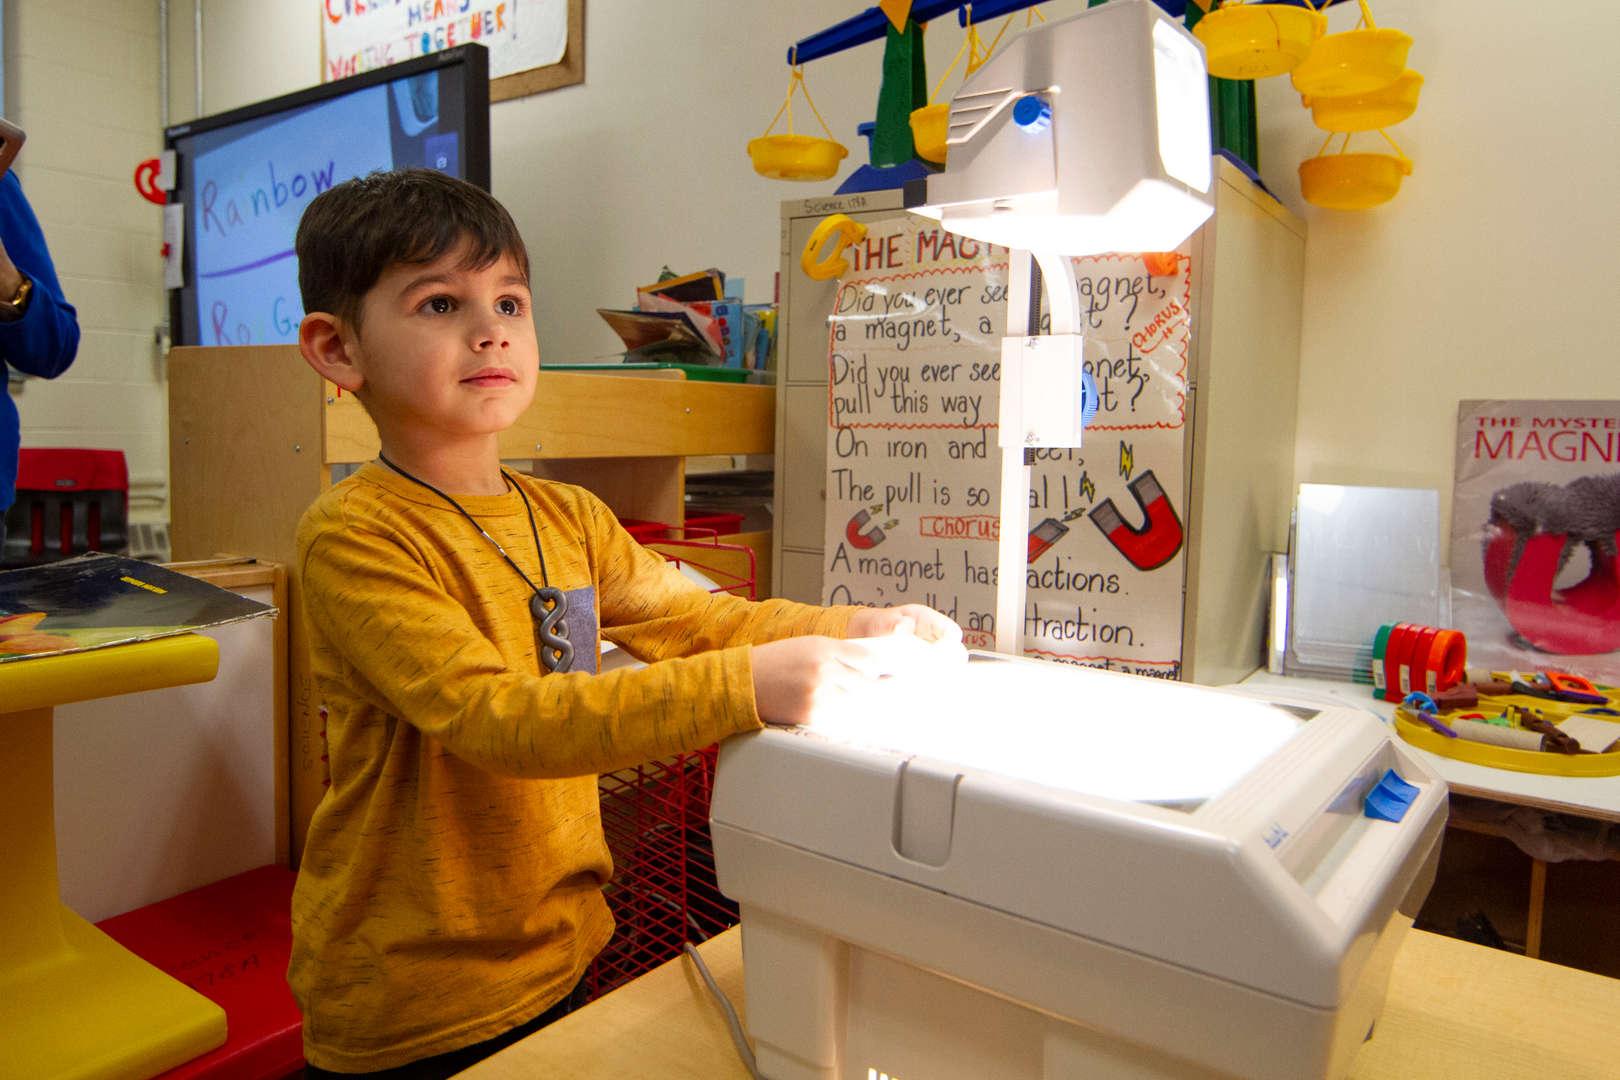 Boy using projector